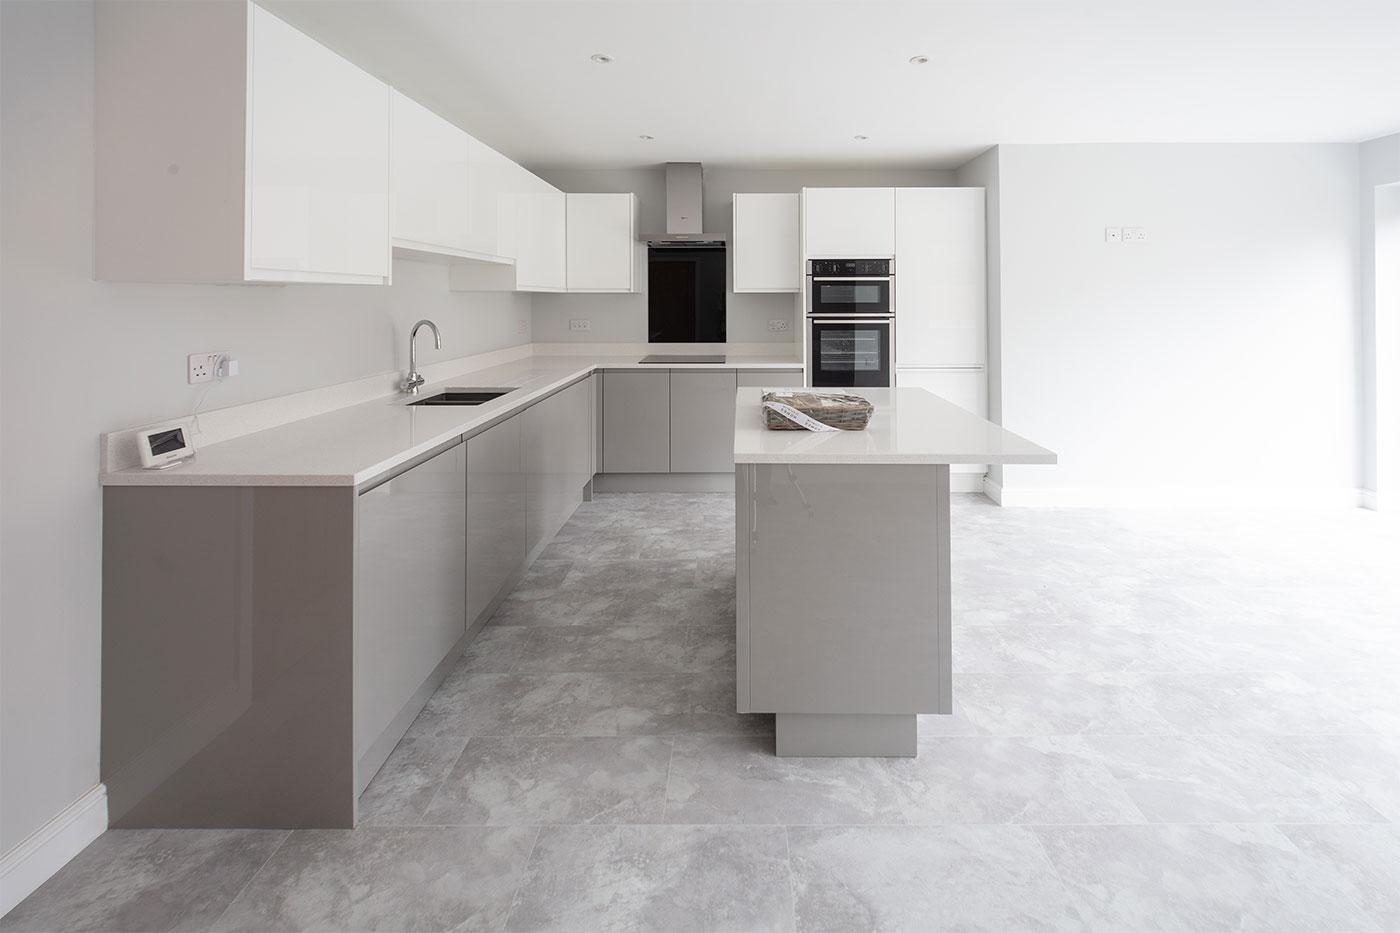 Grey modern kitchen in new build home